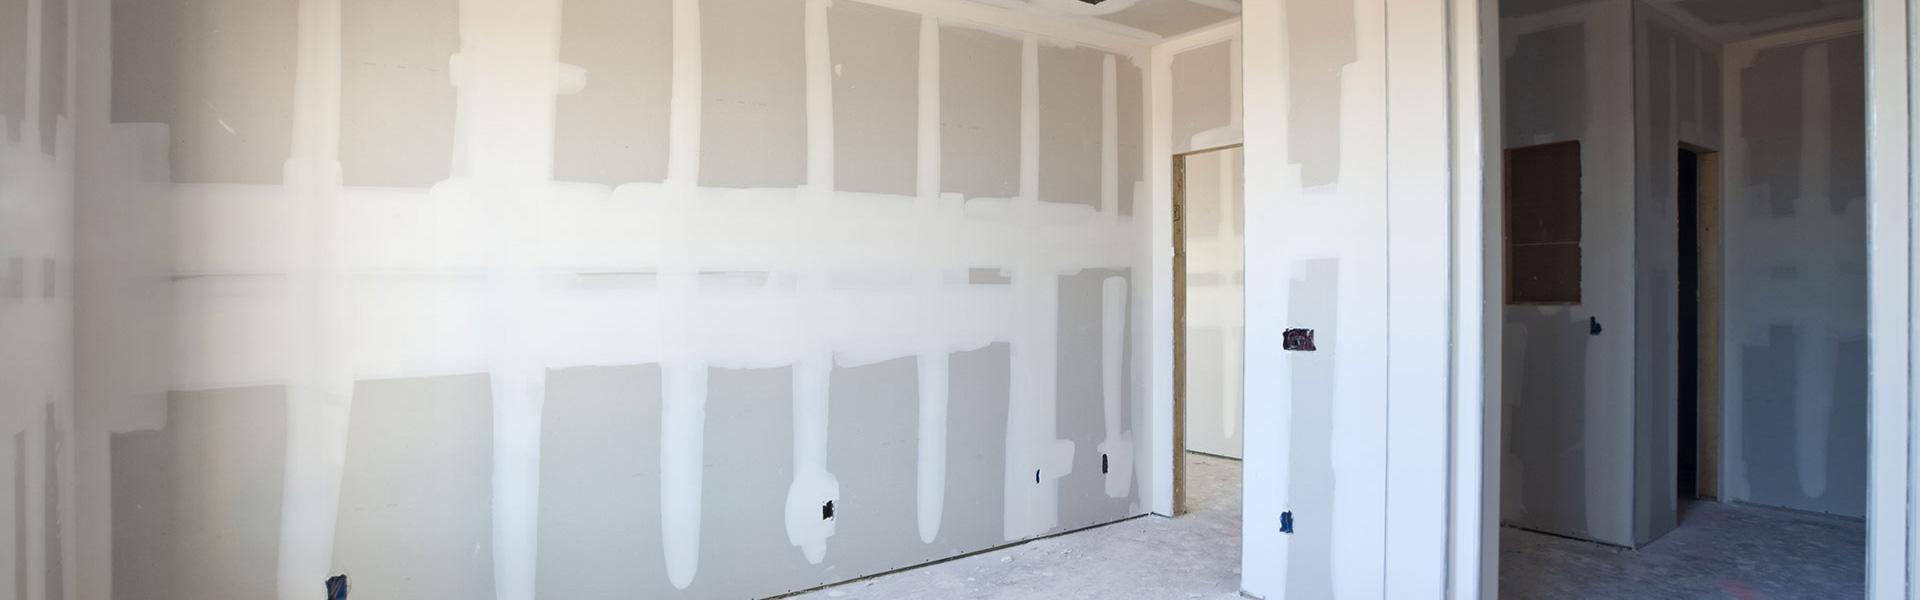 vaal-ceilings-drywall-partitions